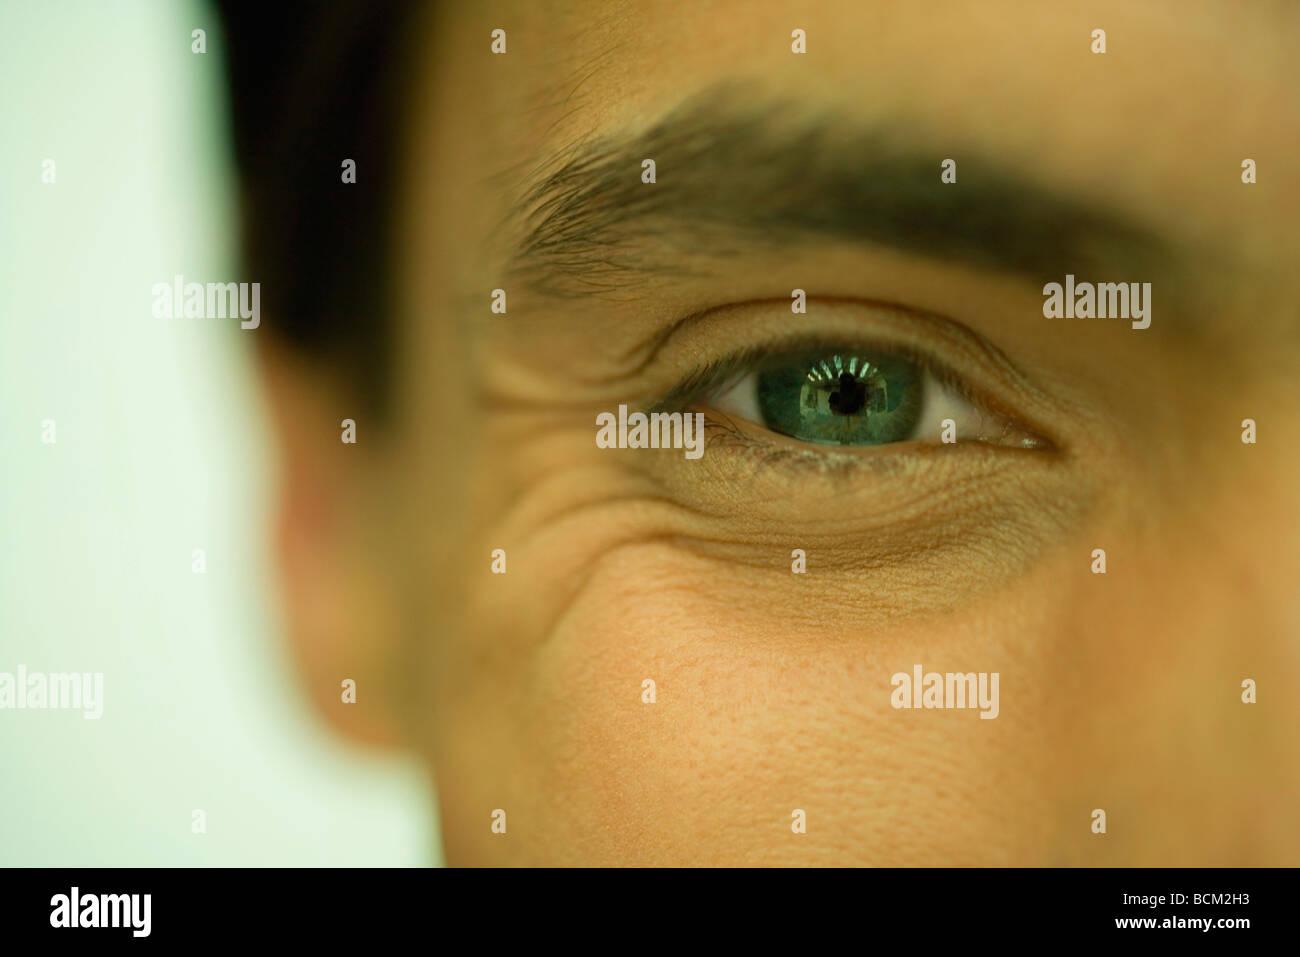 Man looking cheerfully at camera, cropped view of eye - Stock Image